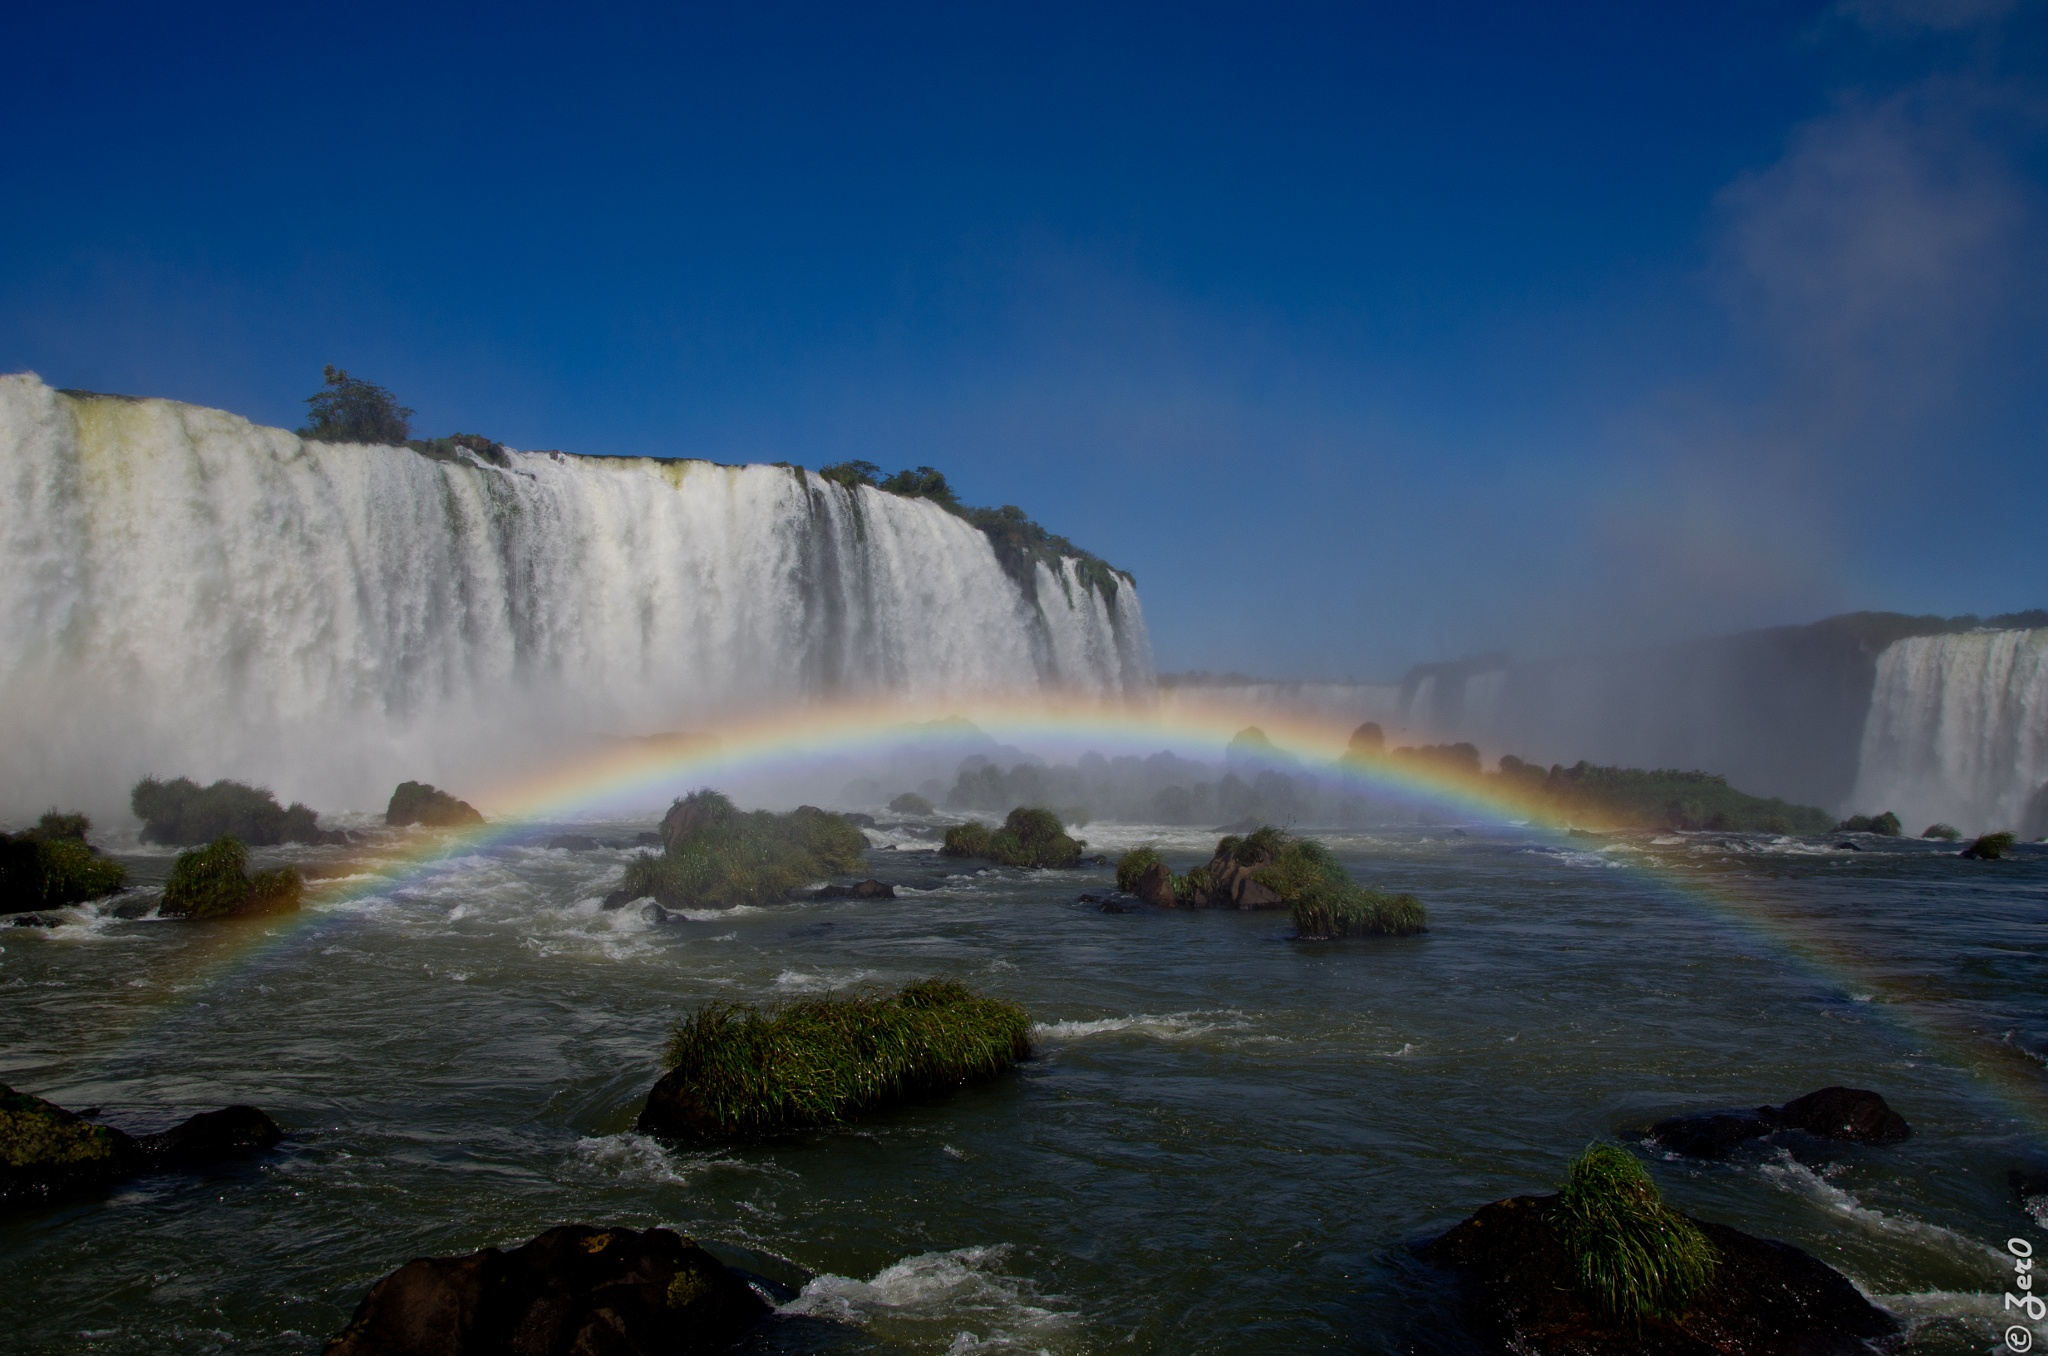 Foz Iguaçu by Jose Roberto Magalhaes